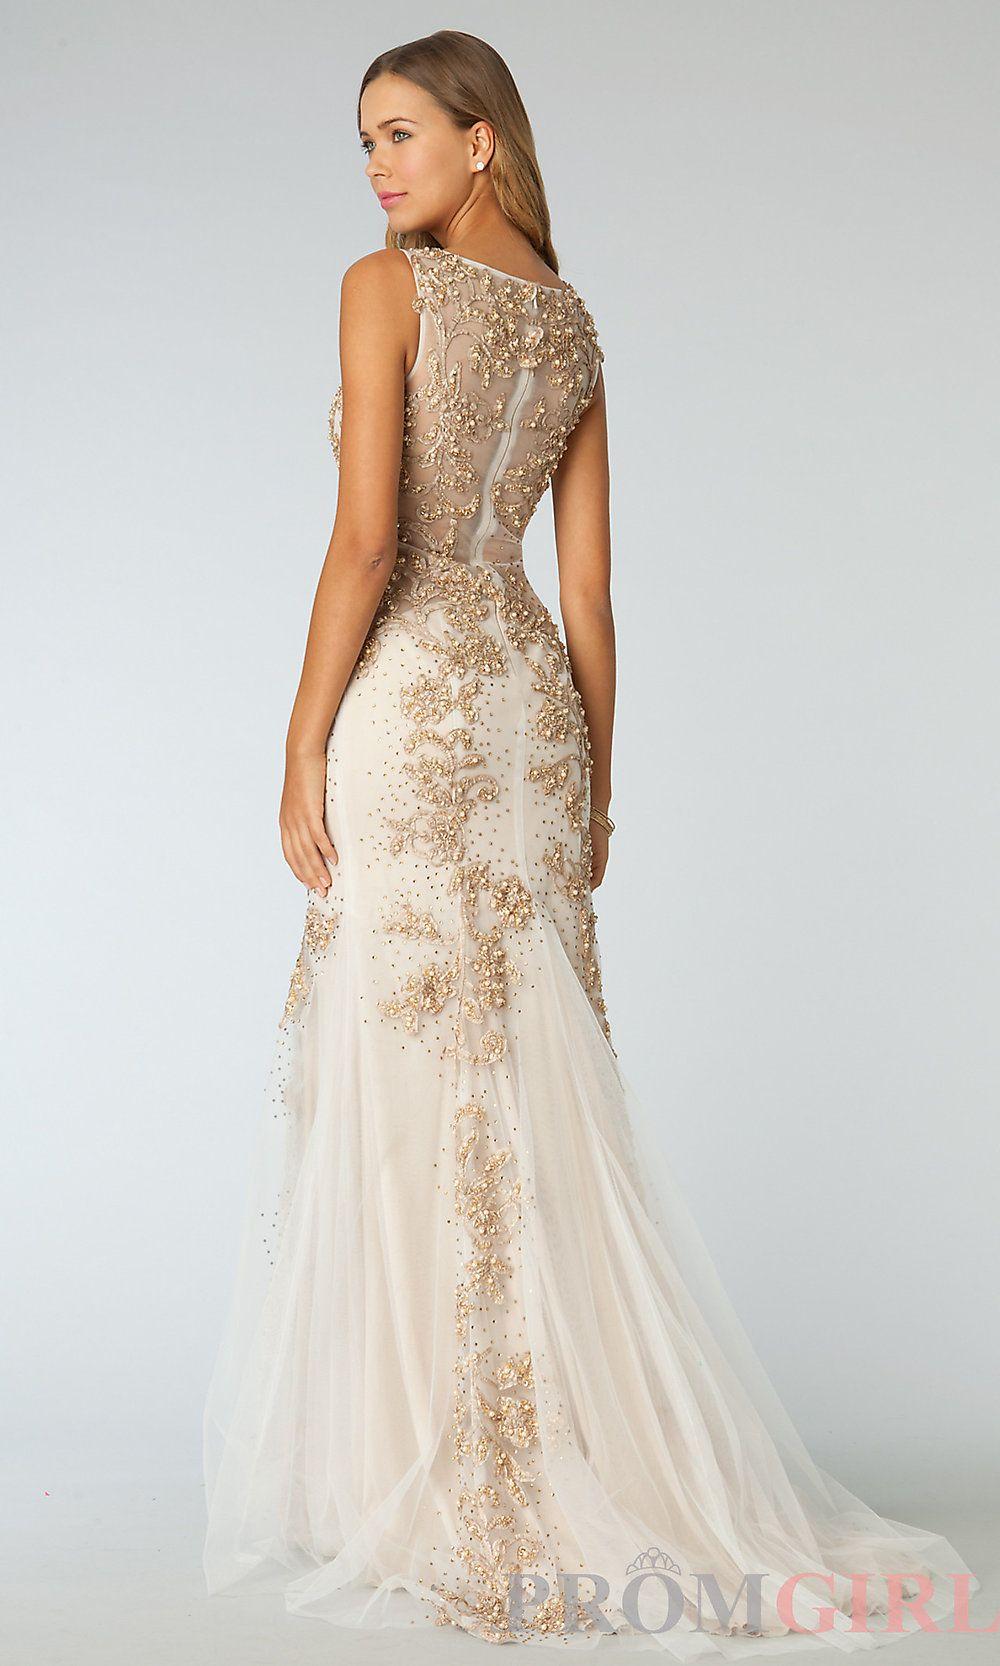 Long prom dress style atac front image promspiration